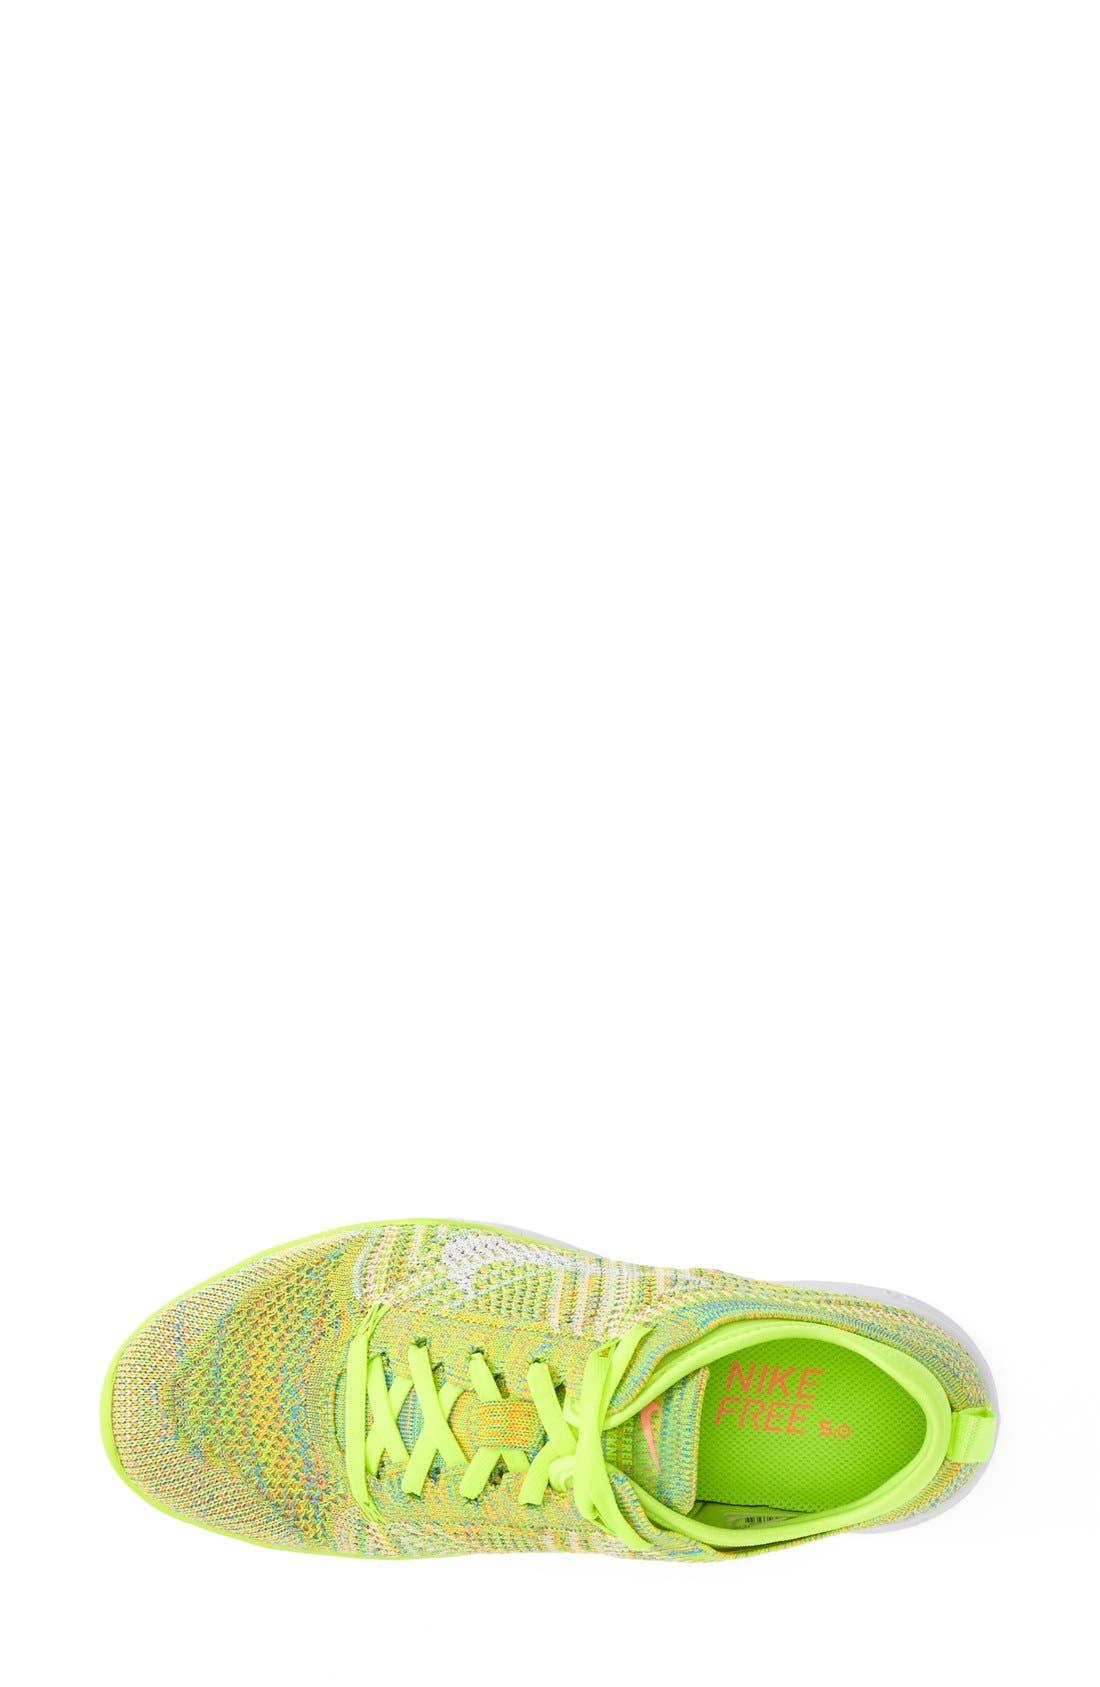 ,                             'Free Flyknit 5.0 TR' Training Shoe,                             Alternate thumbnail 55, color,                             700